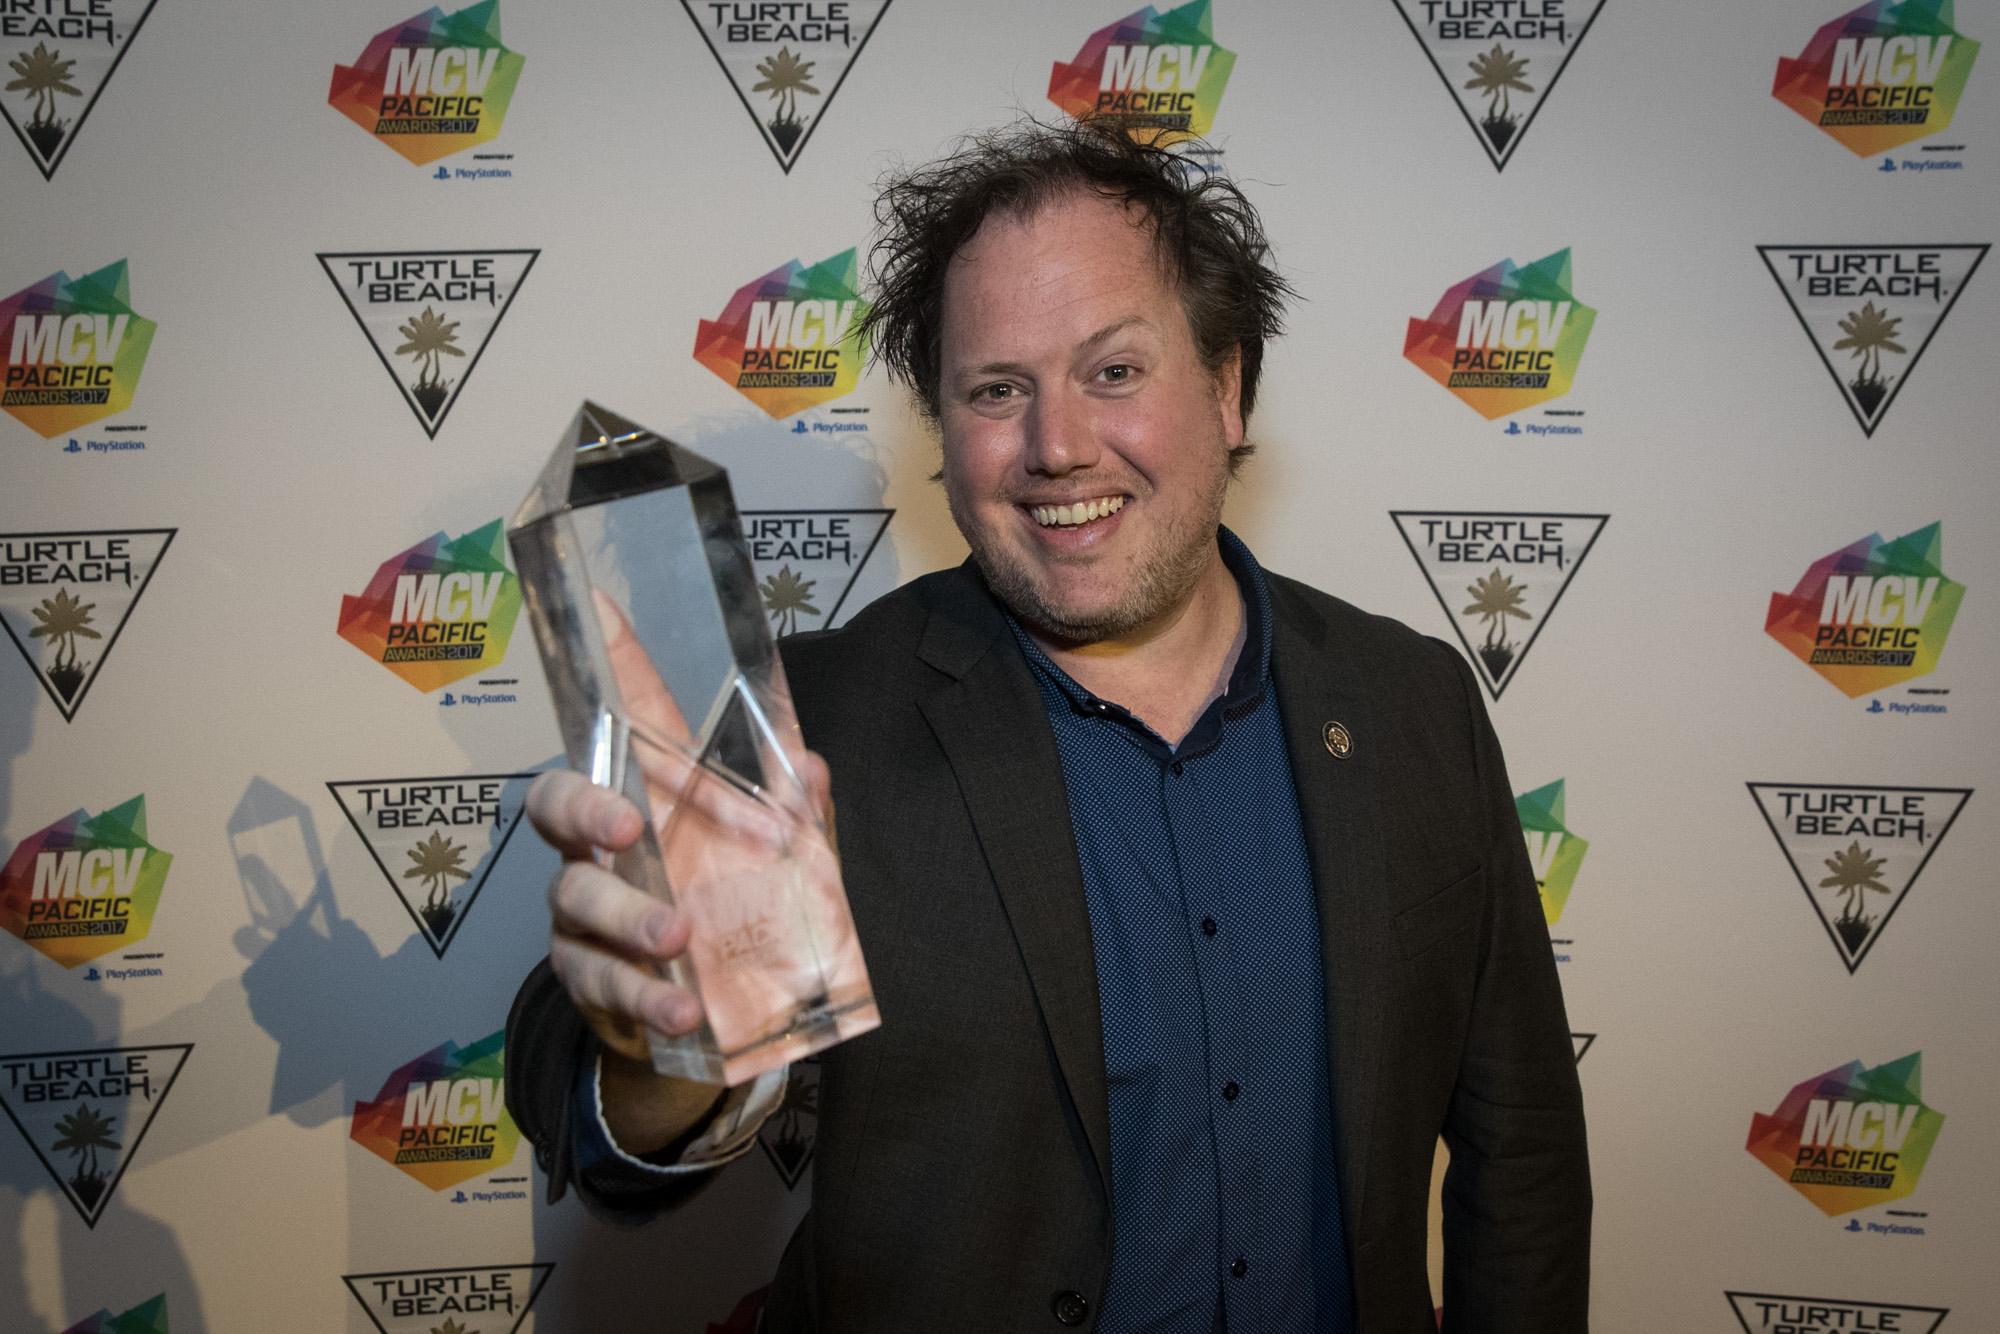 MCV_Pacific_Awards_1_June_17_PS_211.jpg